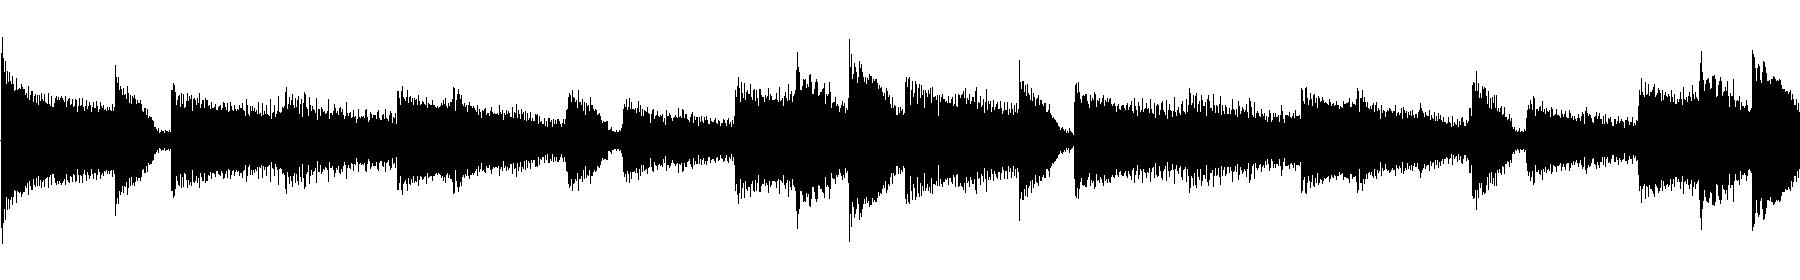 vedh melodyloop 009 c minor 122bpm